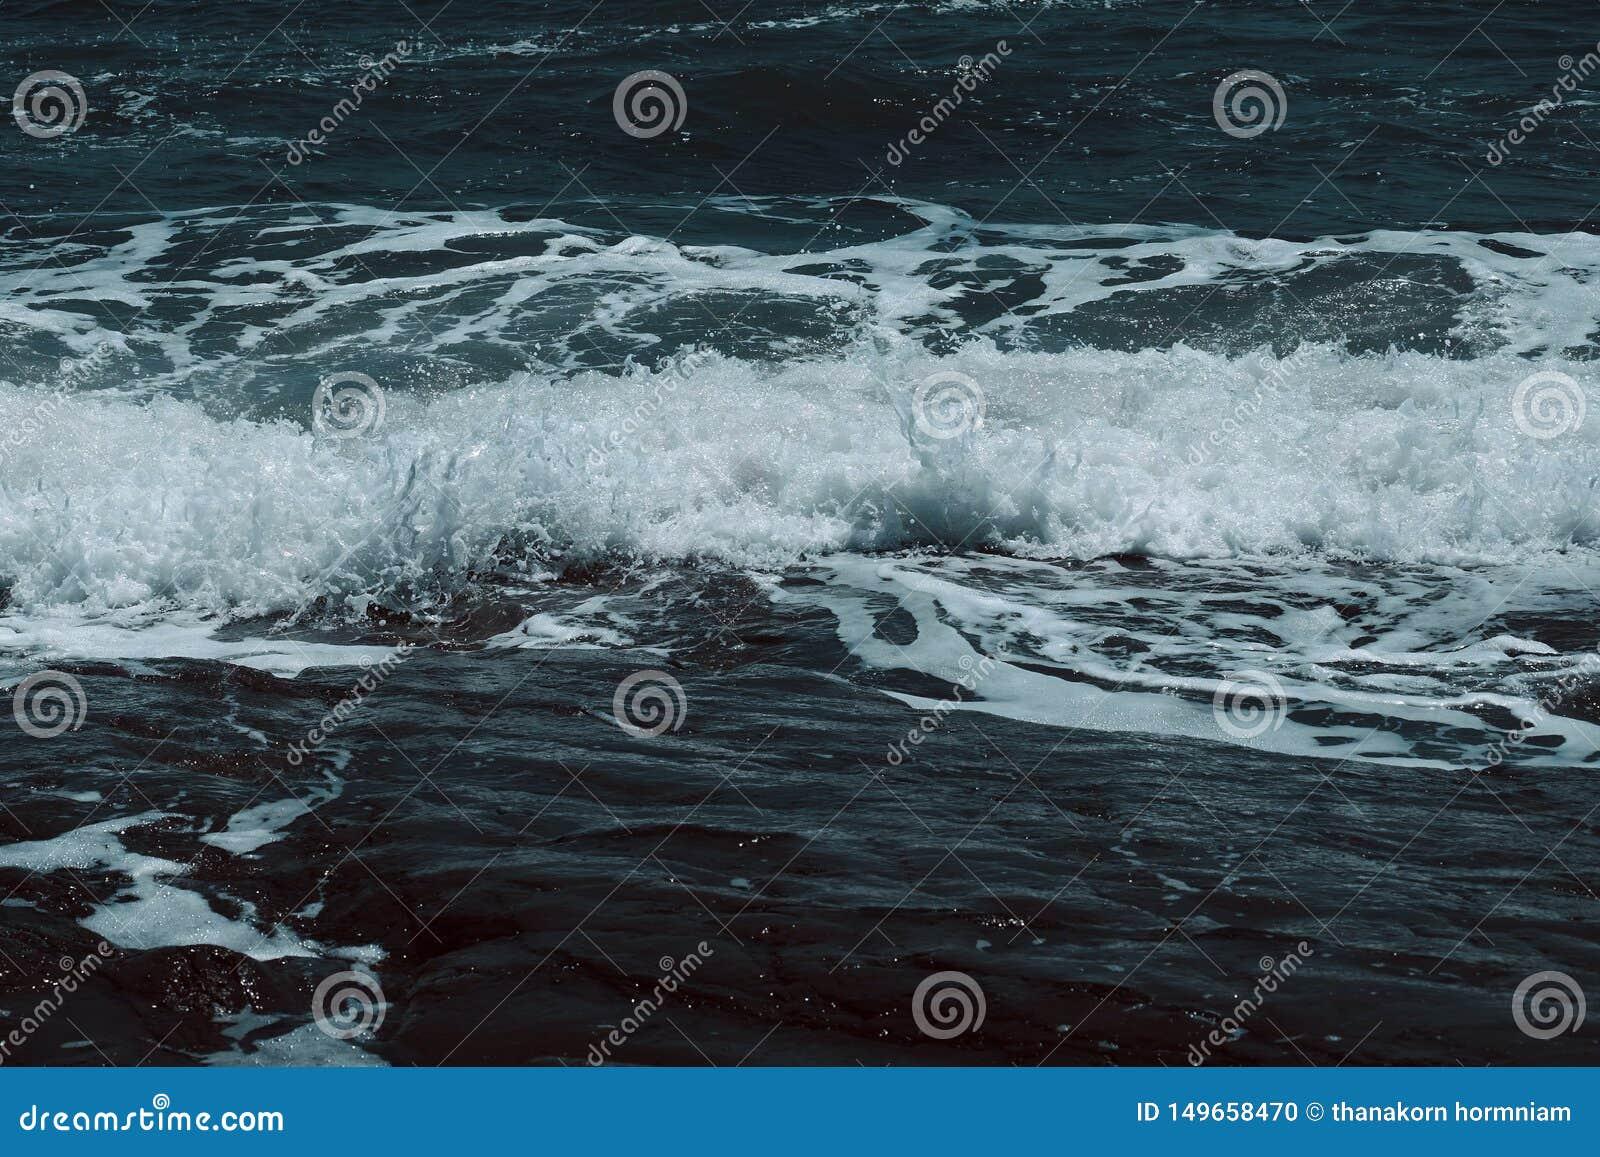 Azul, verano, naturaleza, viaje, mar, onda, dise?o, vacaciones, oc?ano, playa, tropical, paisaje, agua, d?a de fiesta, arena, ext